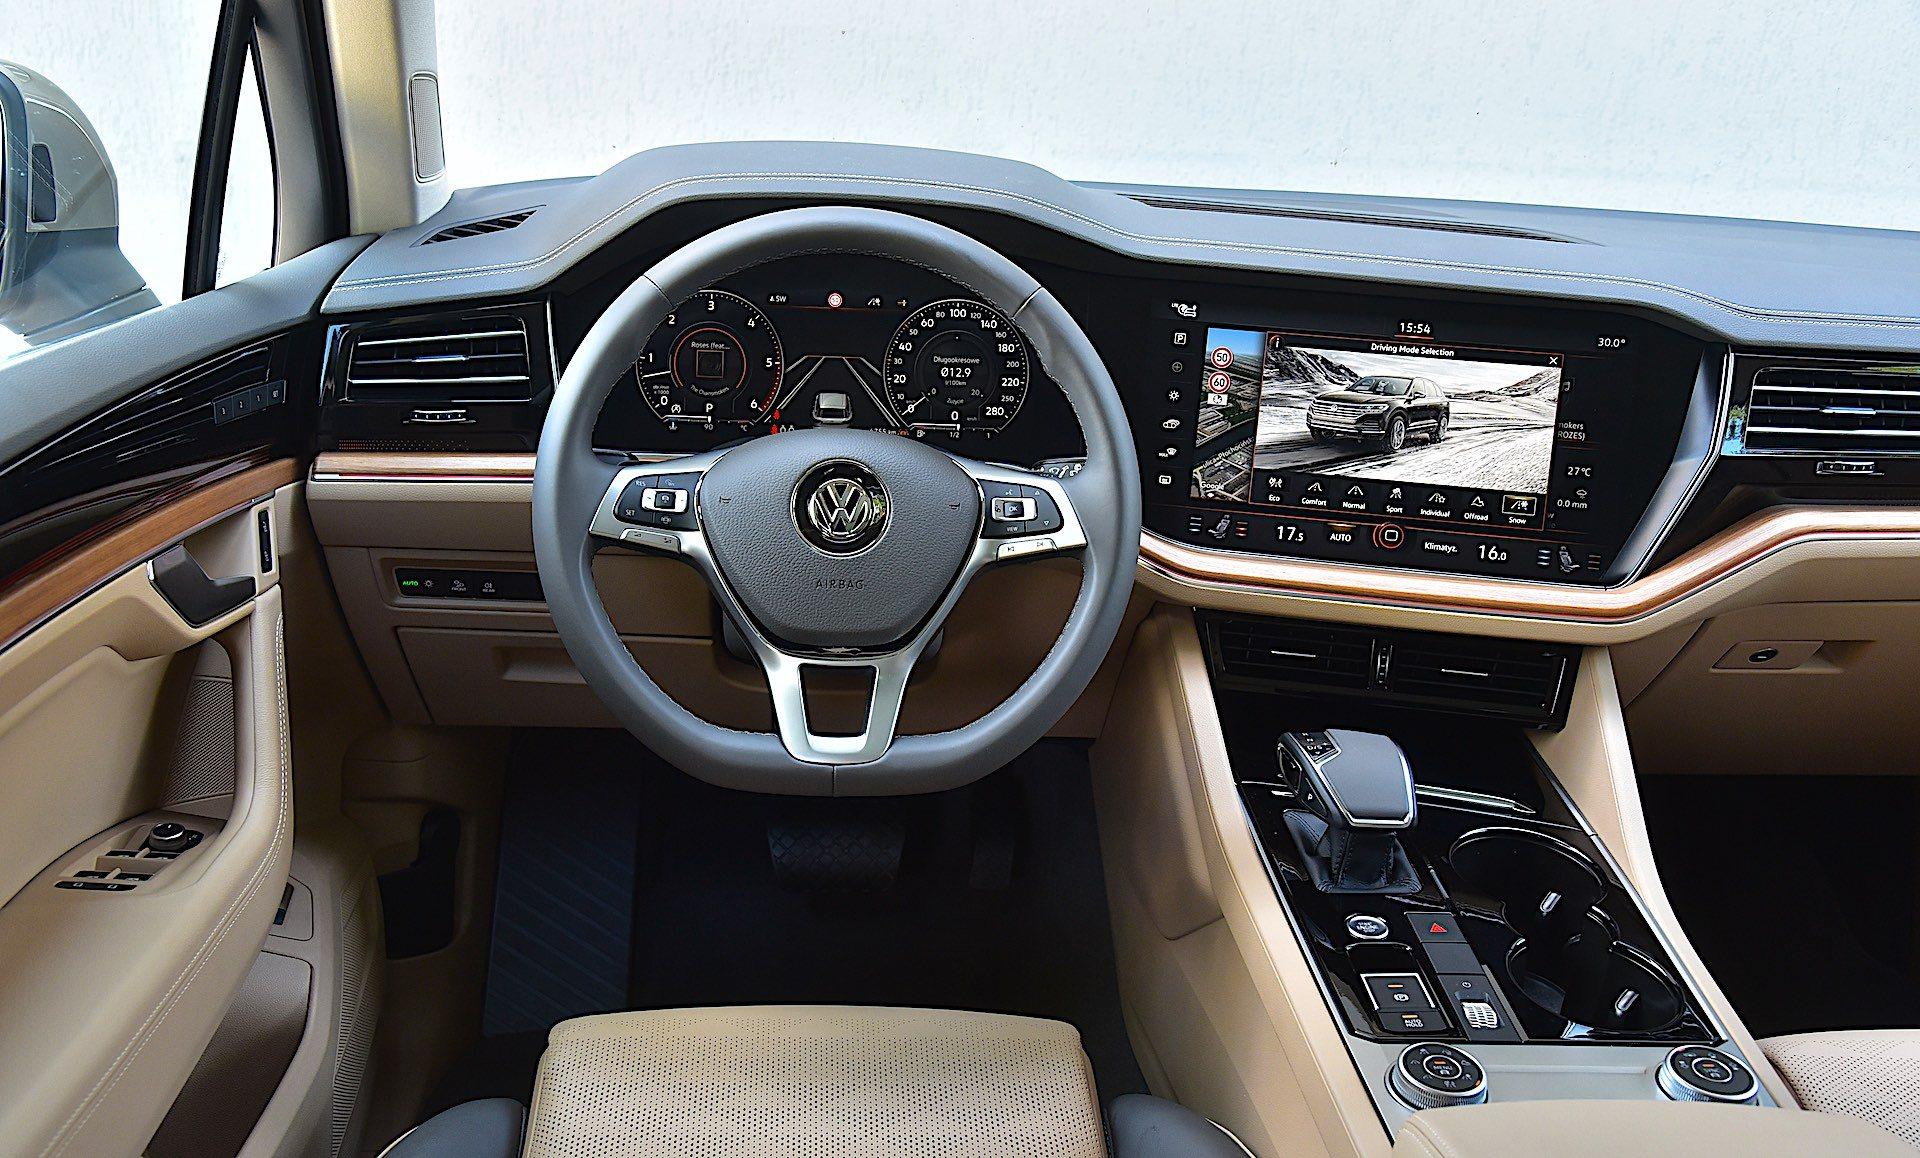 Volkswagen Touareg – Innovision Cockpit